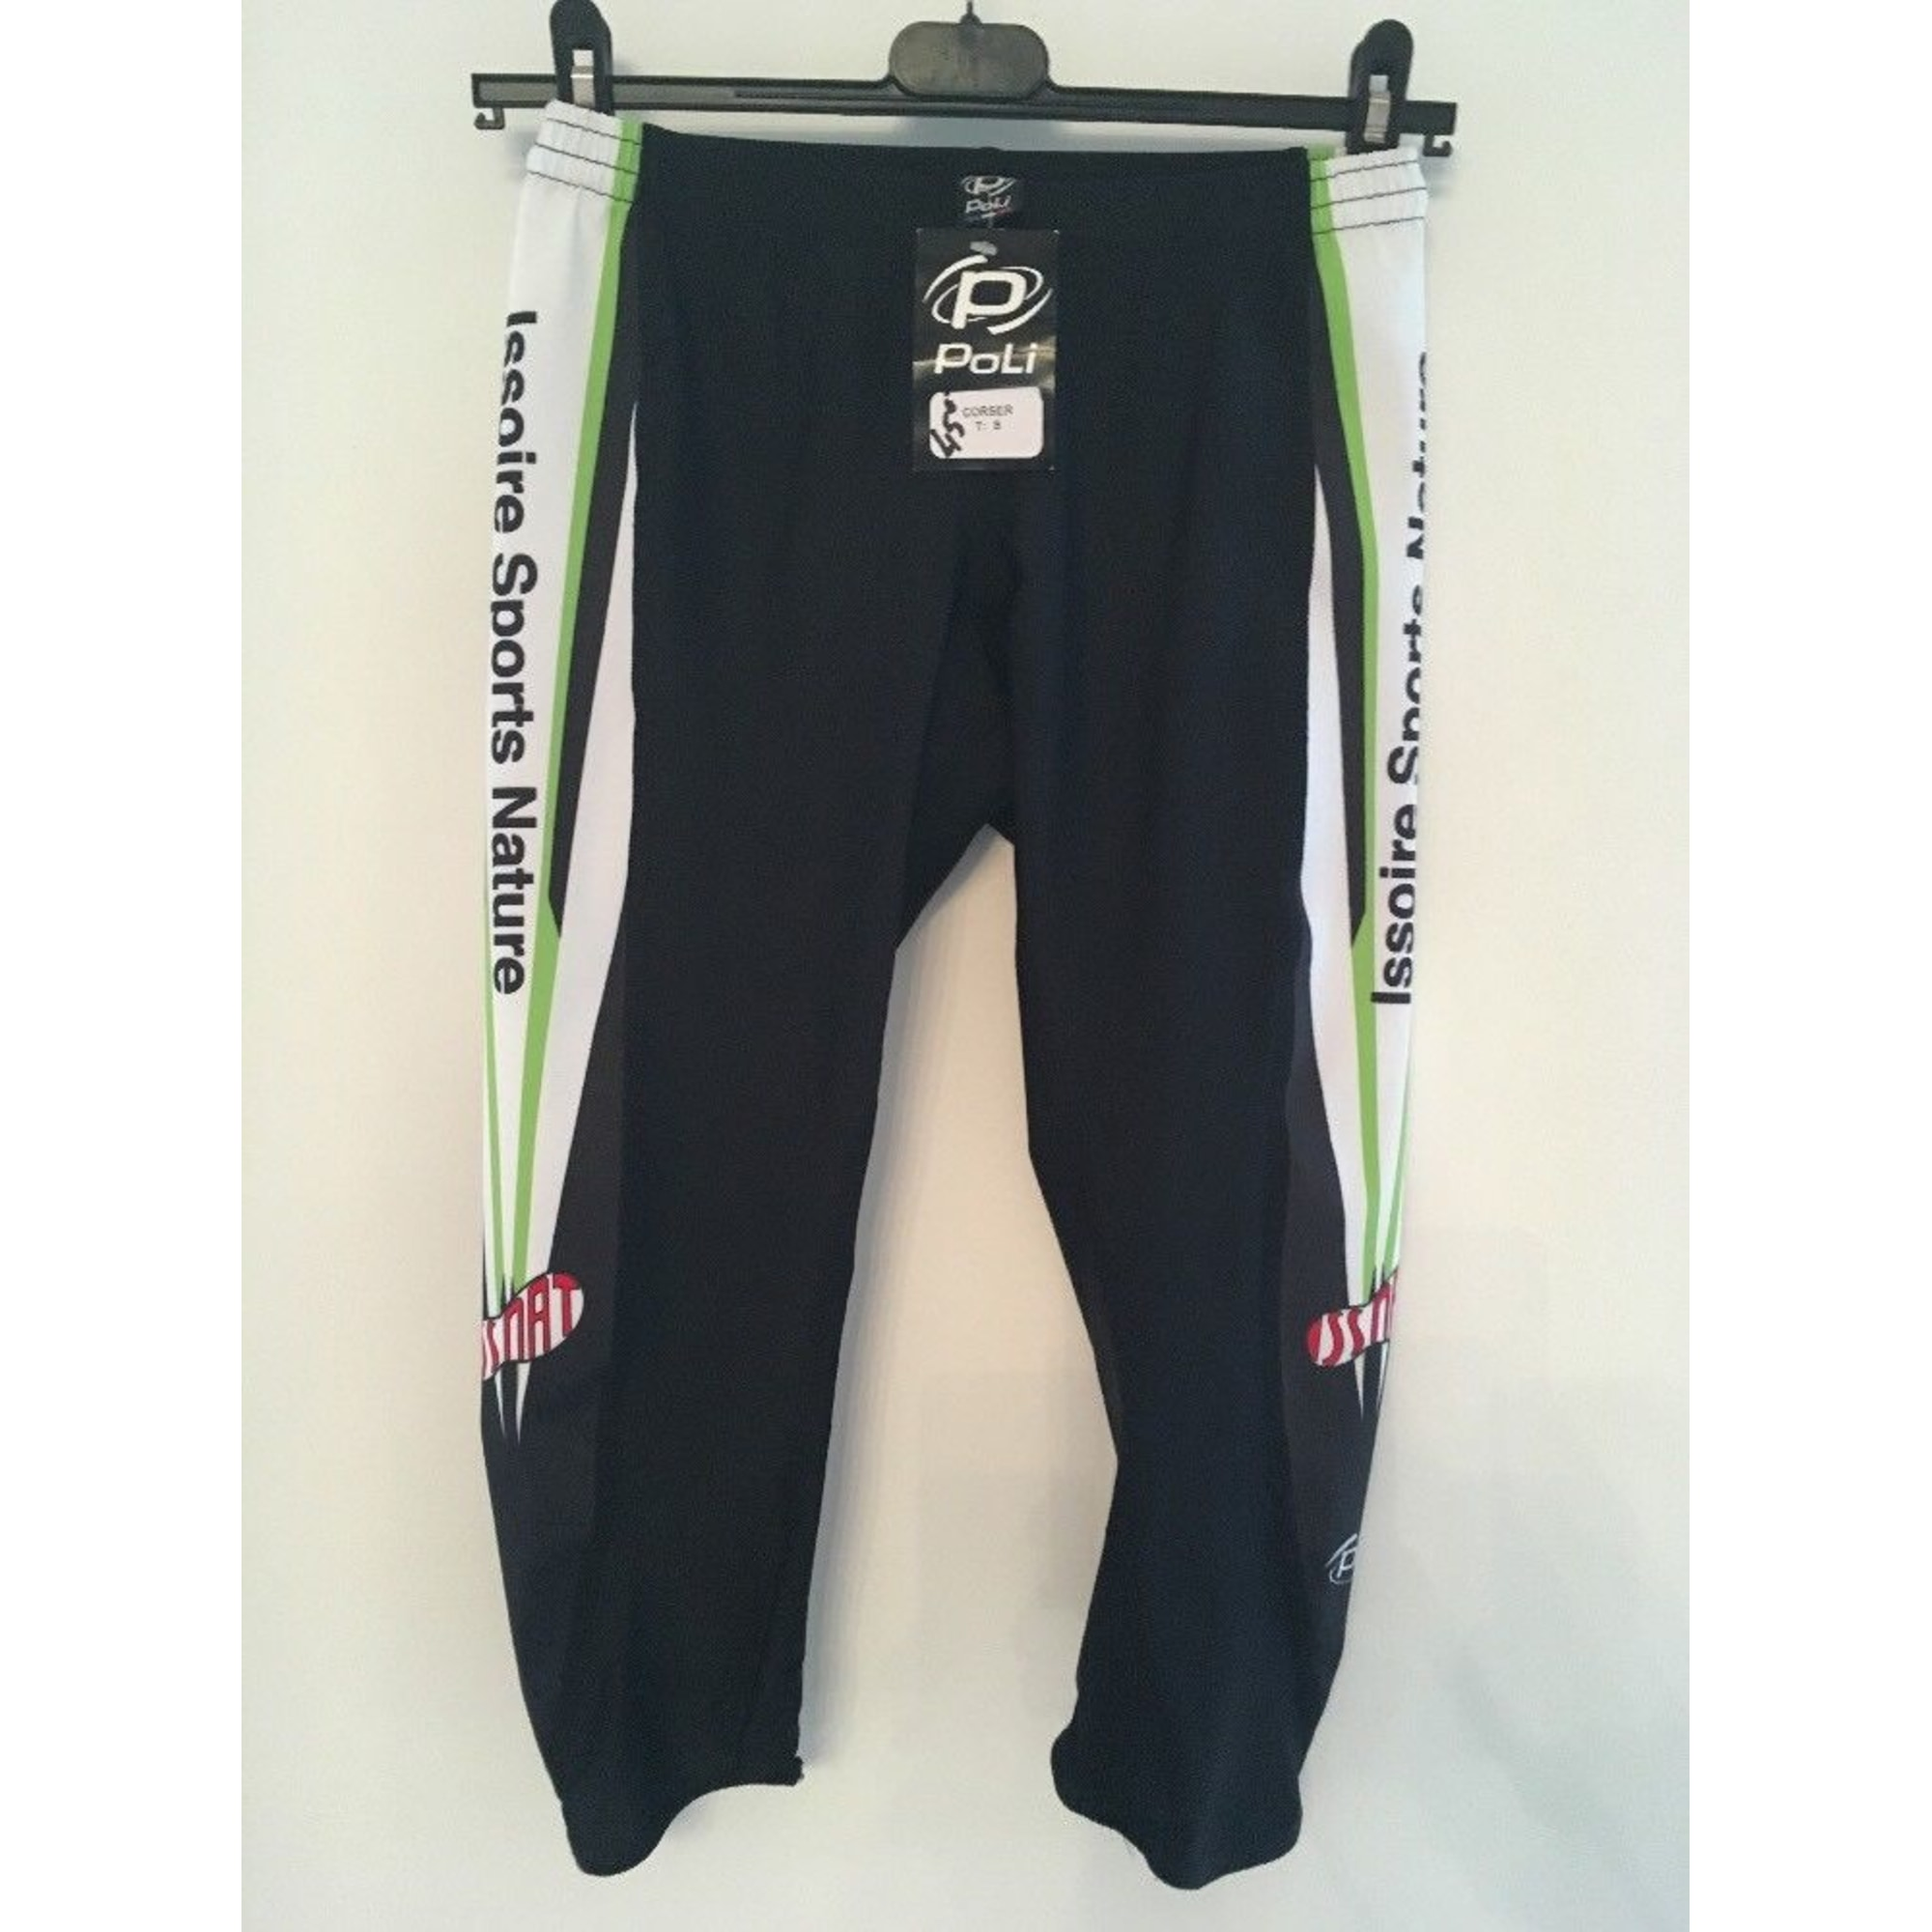 Pantalon de survêtement POLI 44 (S) noir - 7760782 644b8f6da93